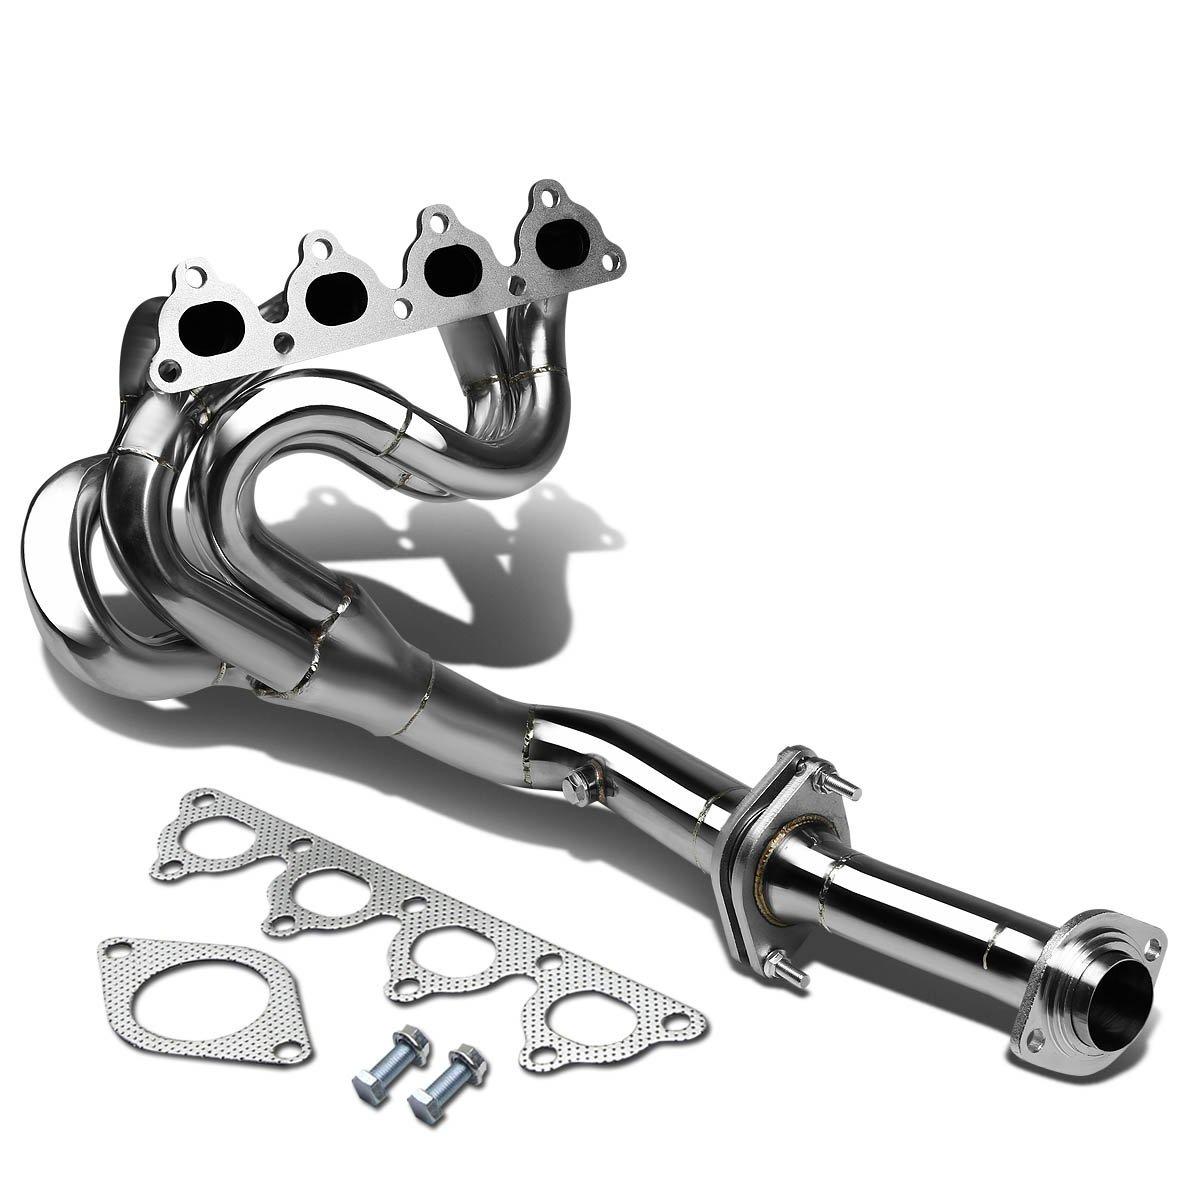 for 88 00 honda civic 1 5 1 6 d15 d16 sohc l4 chrome 4 1 performance header exhaust manifold walmart com